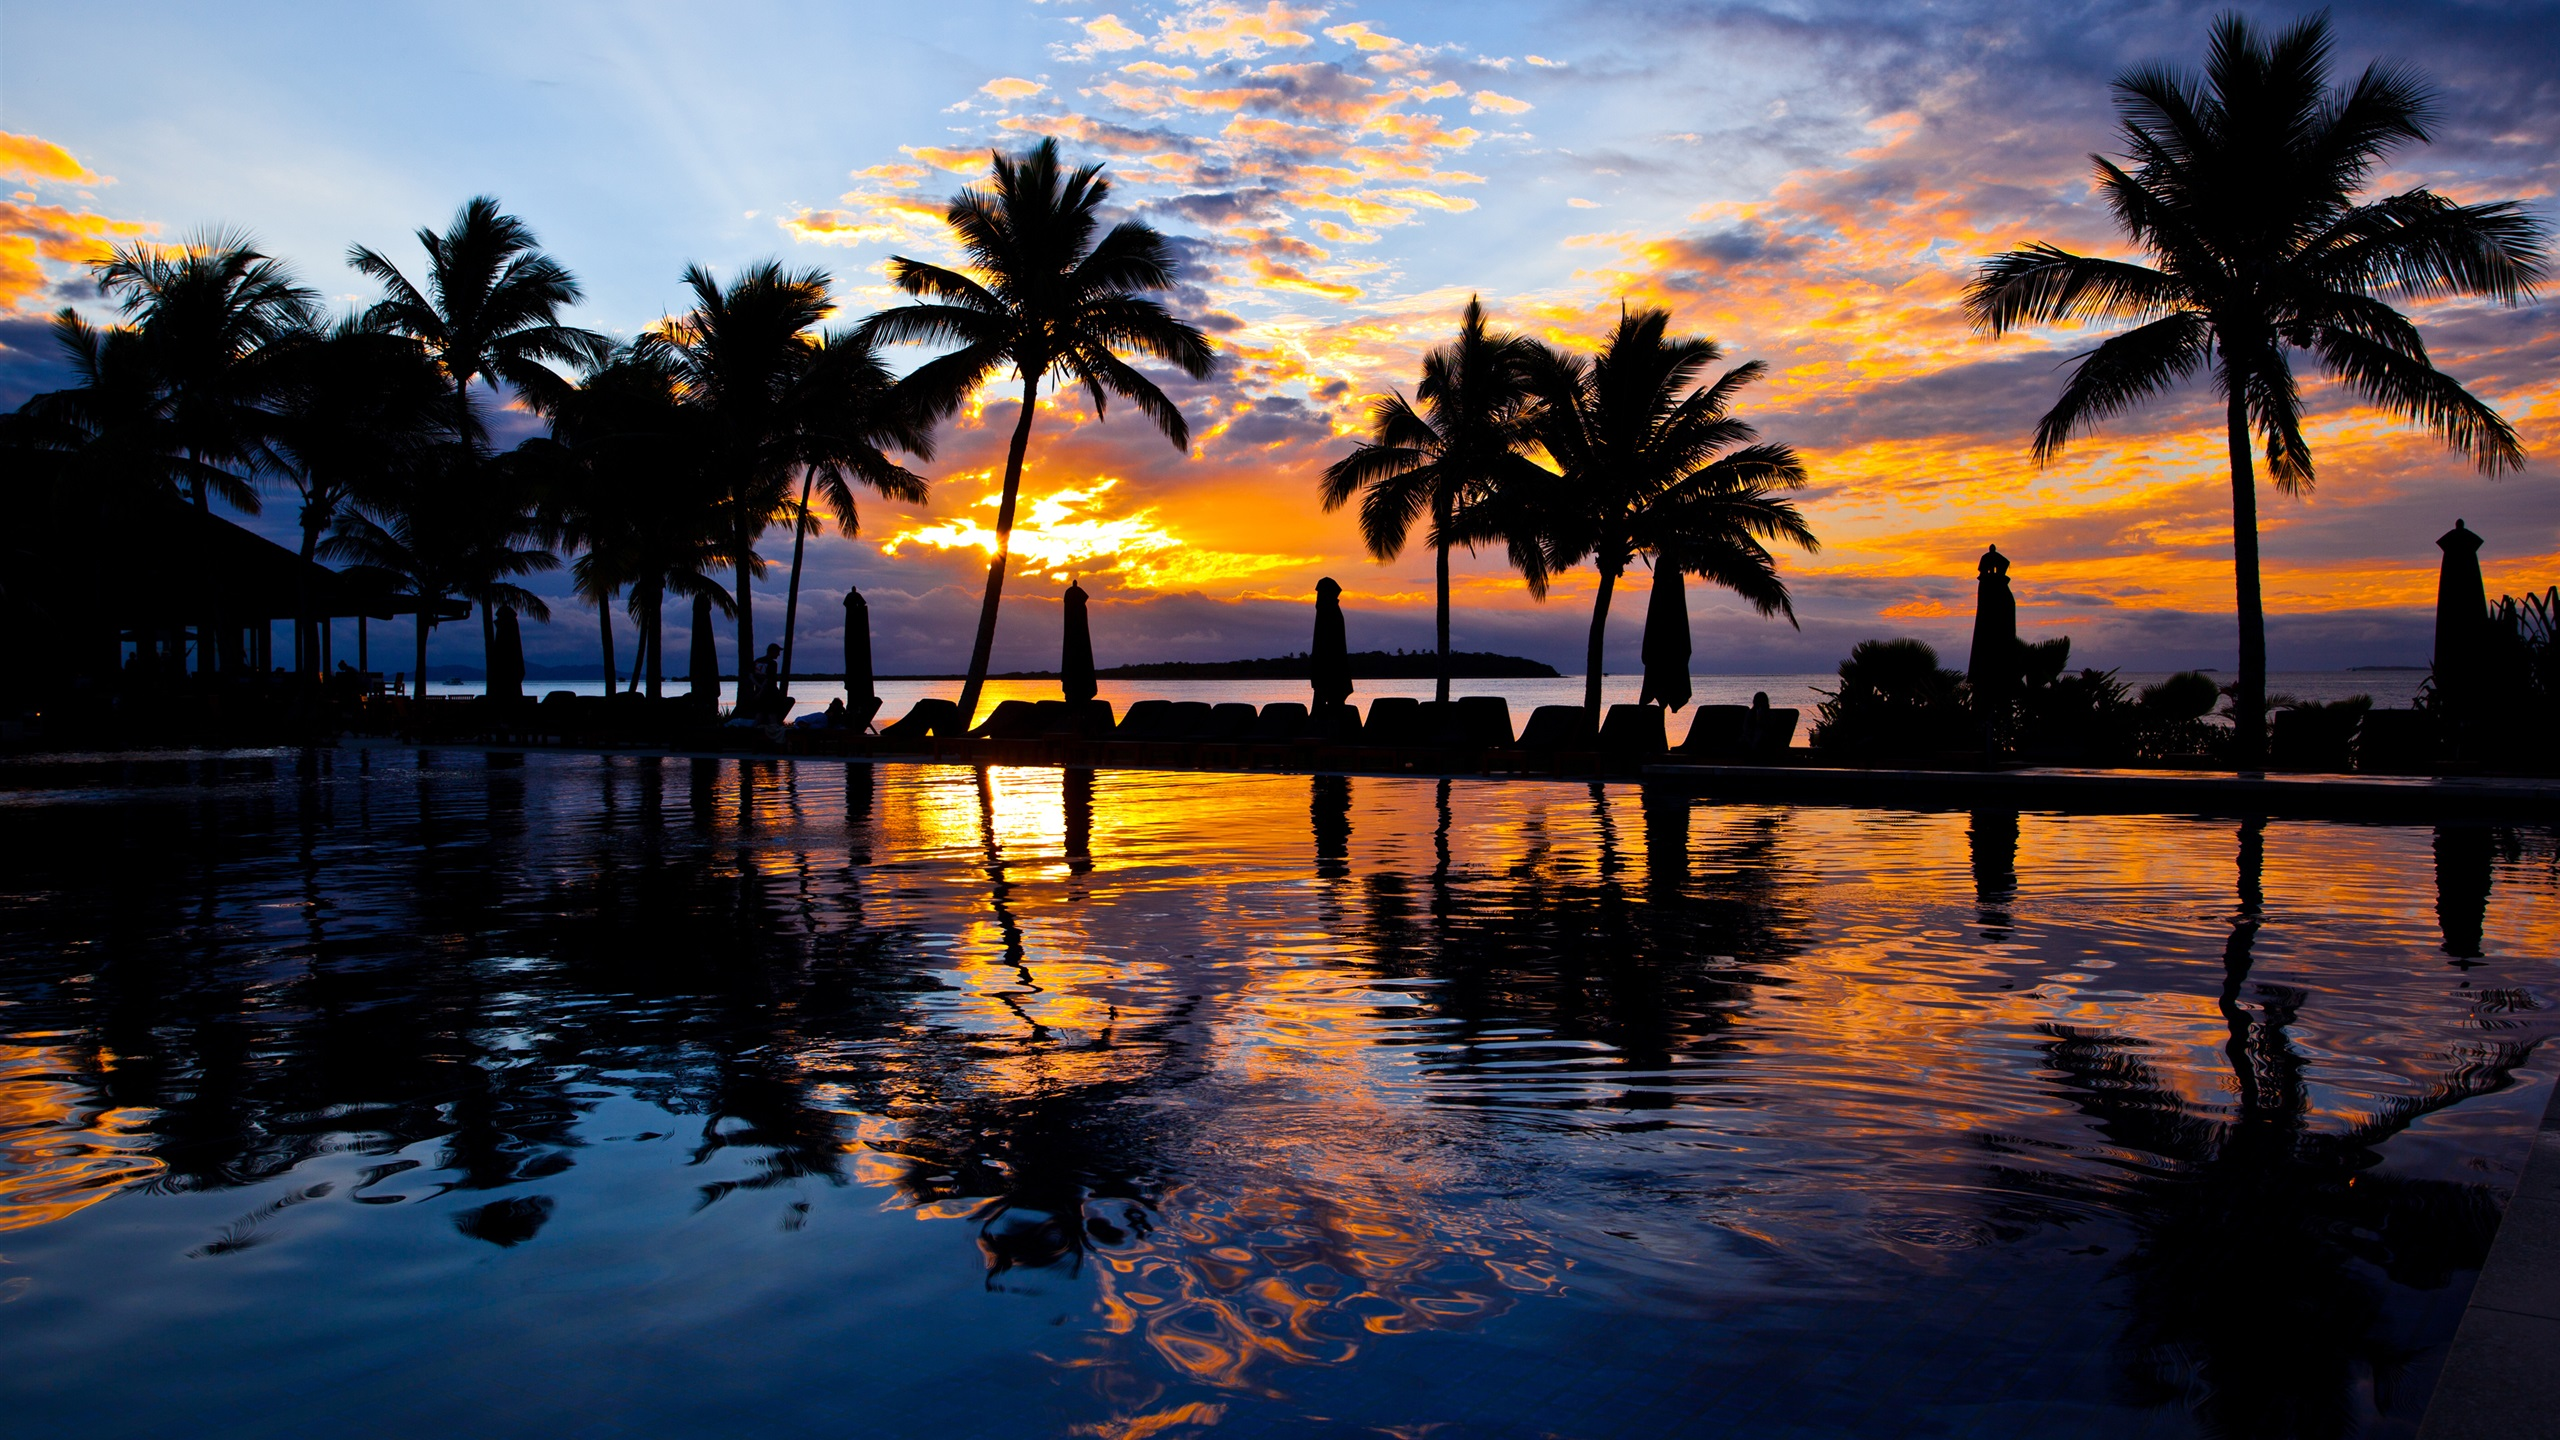 Fondos De Pantalla Iphone 7 Plus: Palmeras, Piscina, Agua, Mar, Playa, Puesta Del Sol, La